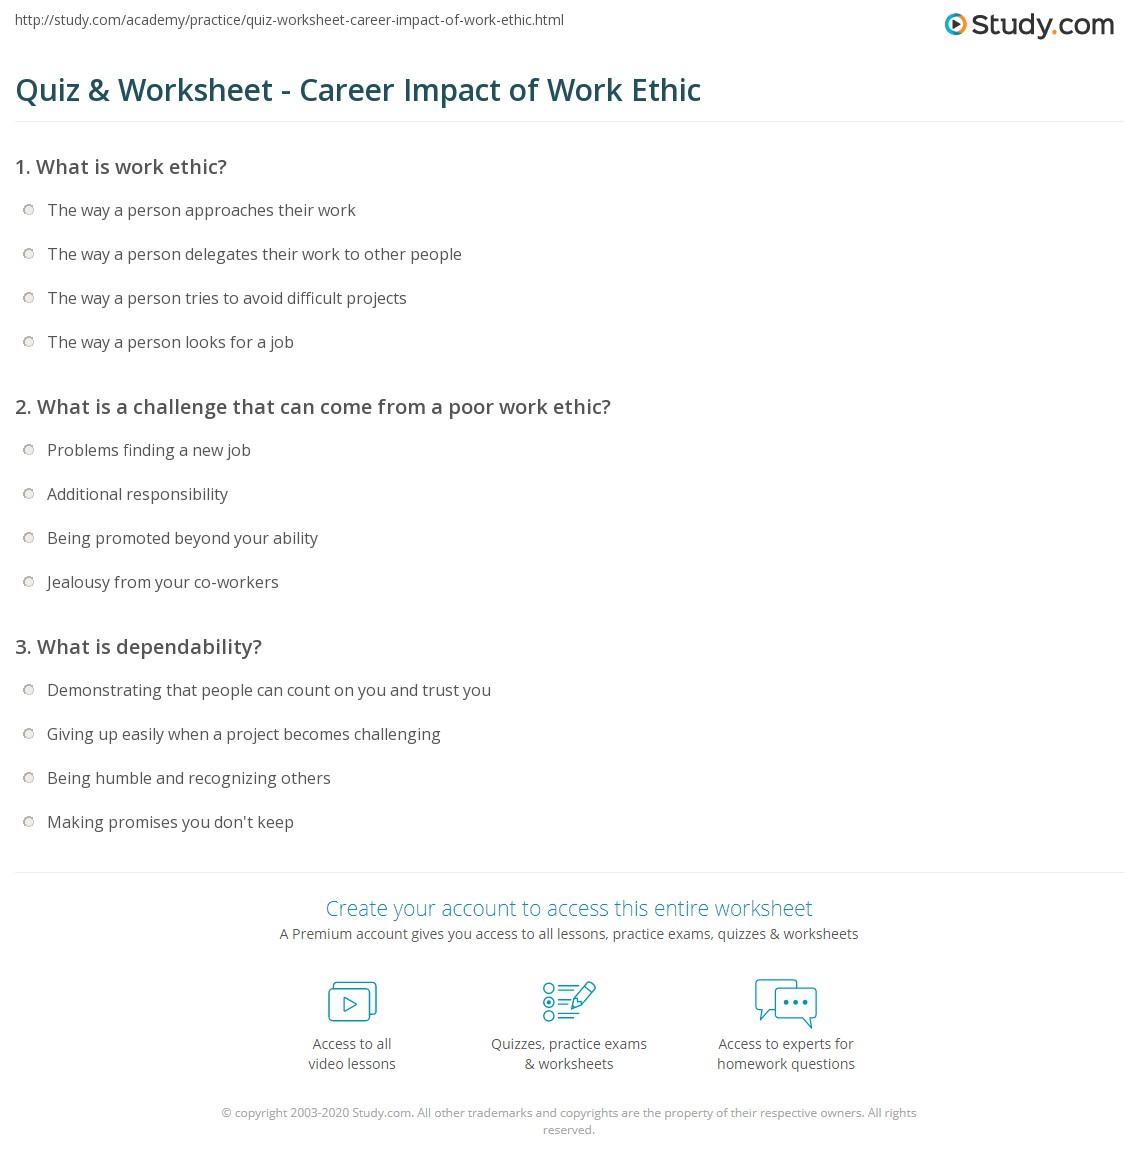 quiz worksheet career impact of work ethic com print how your work ethic impacts your career worksheet